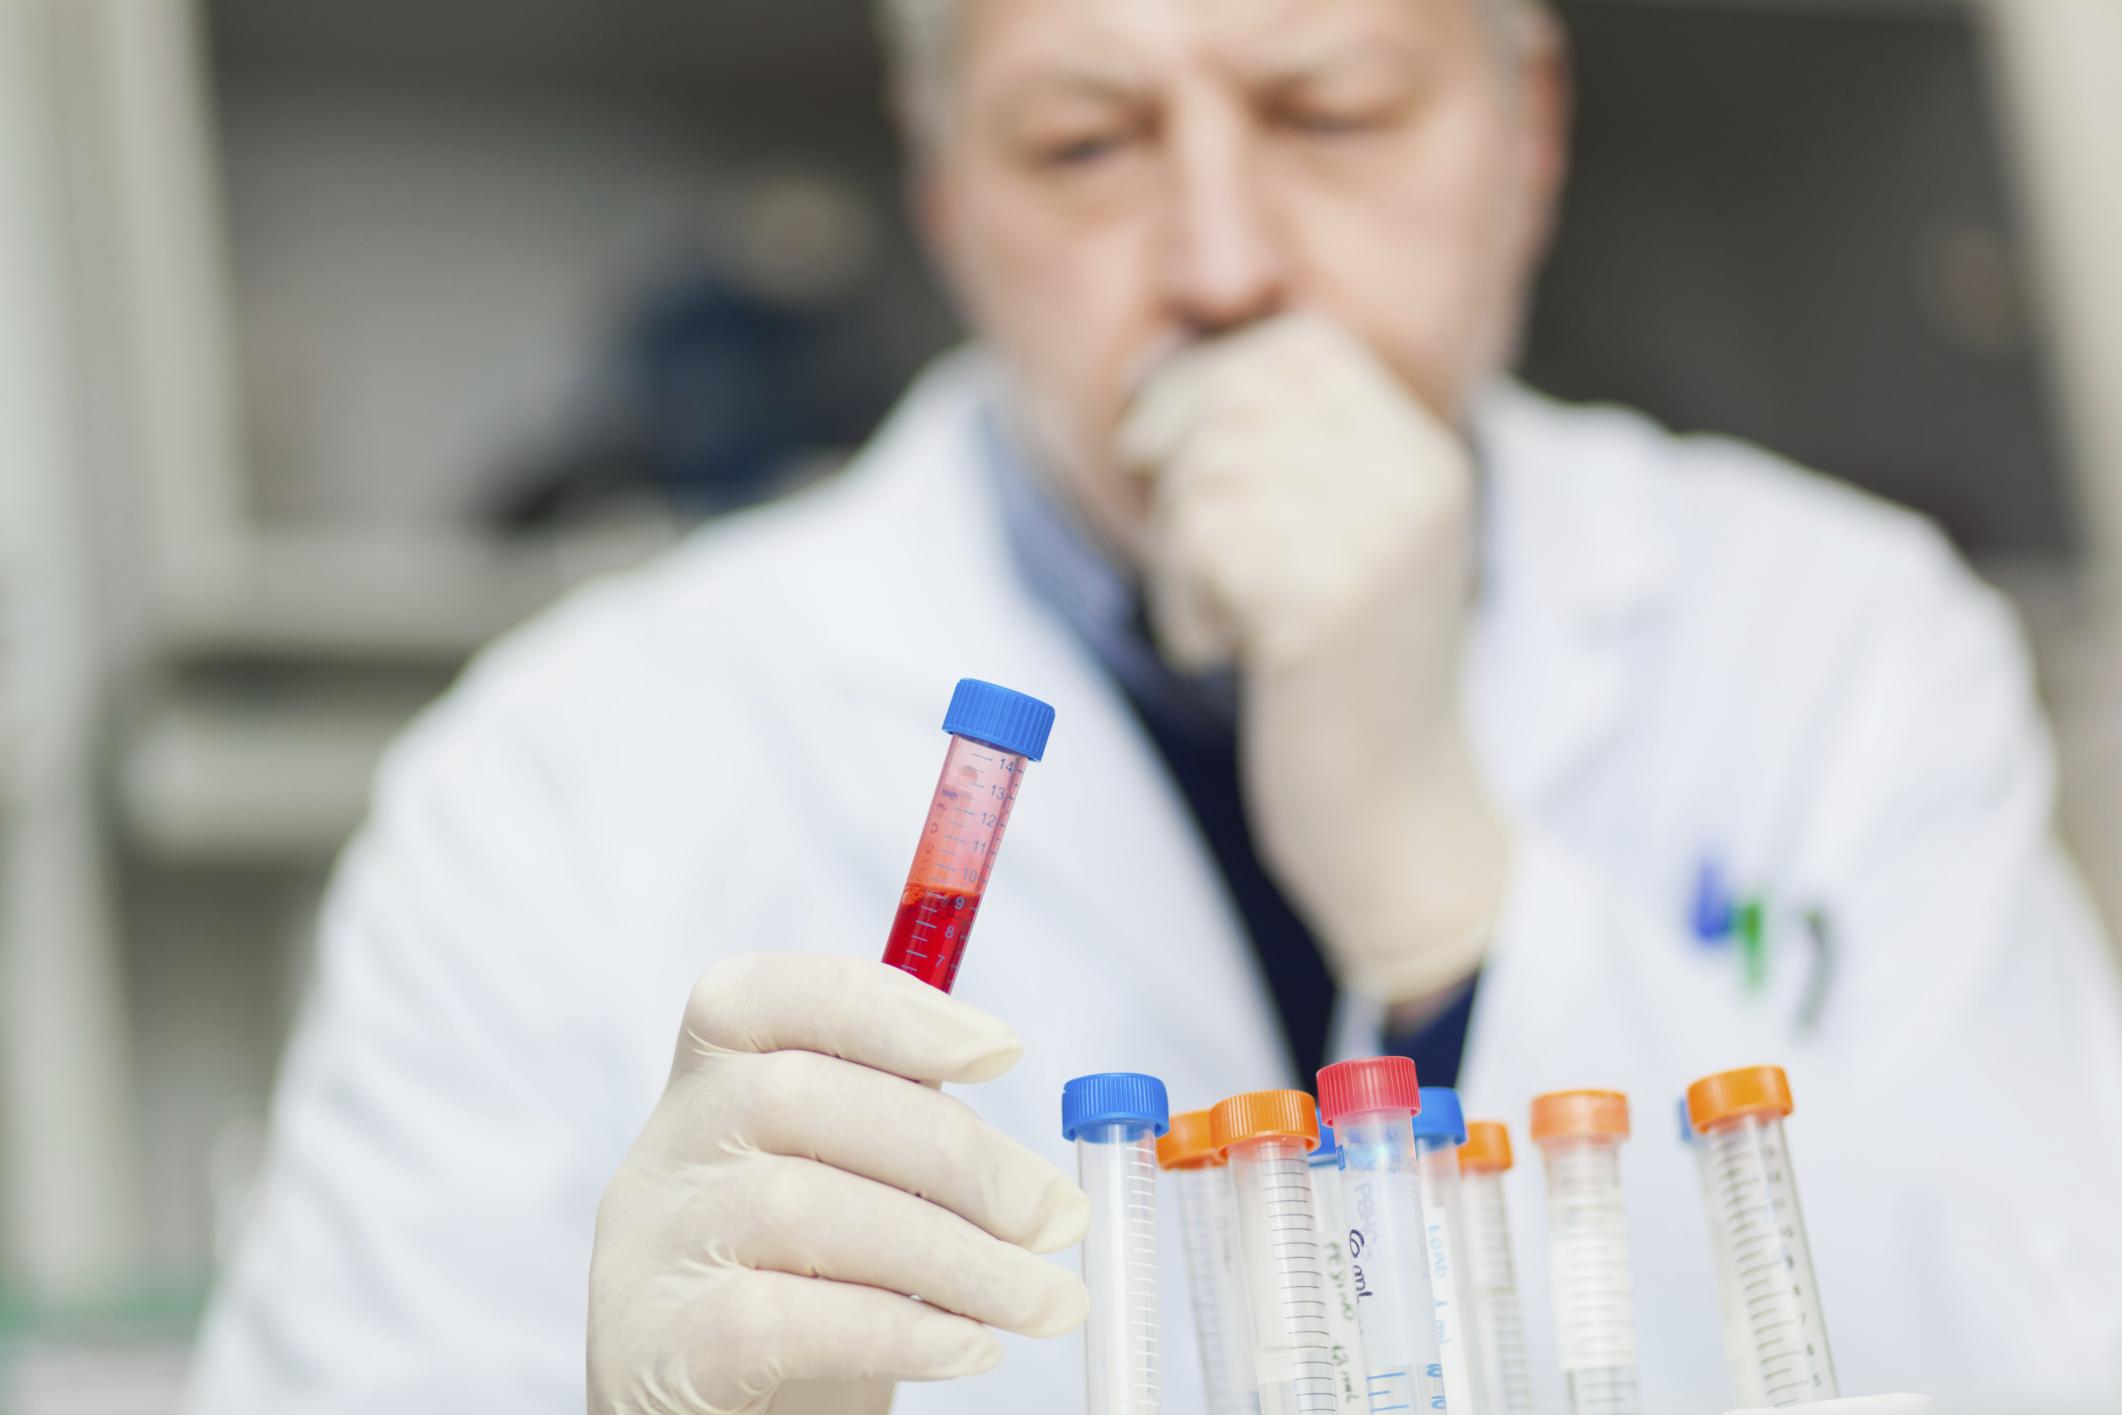 Symptoms Of Dilantin Toxicity Healthfully